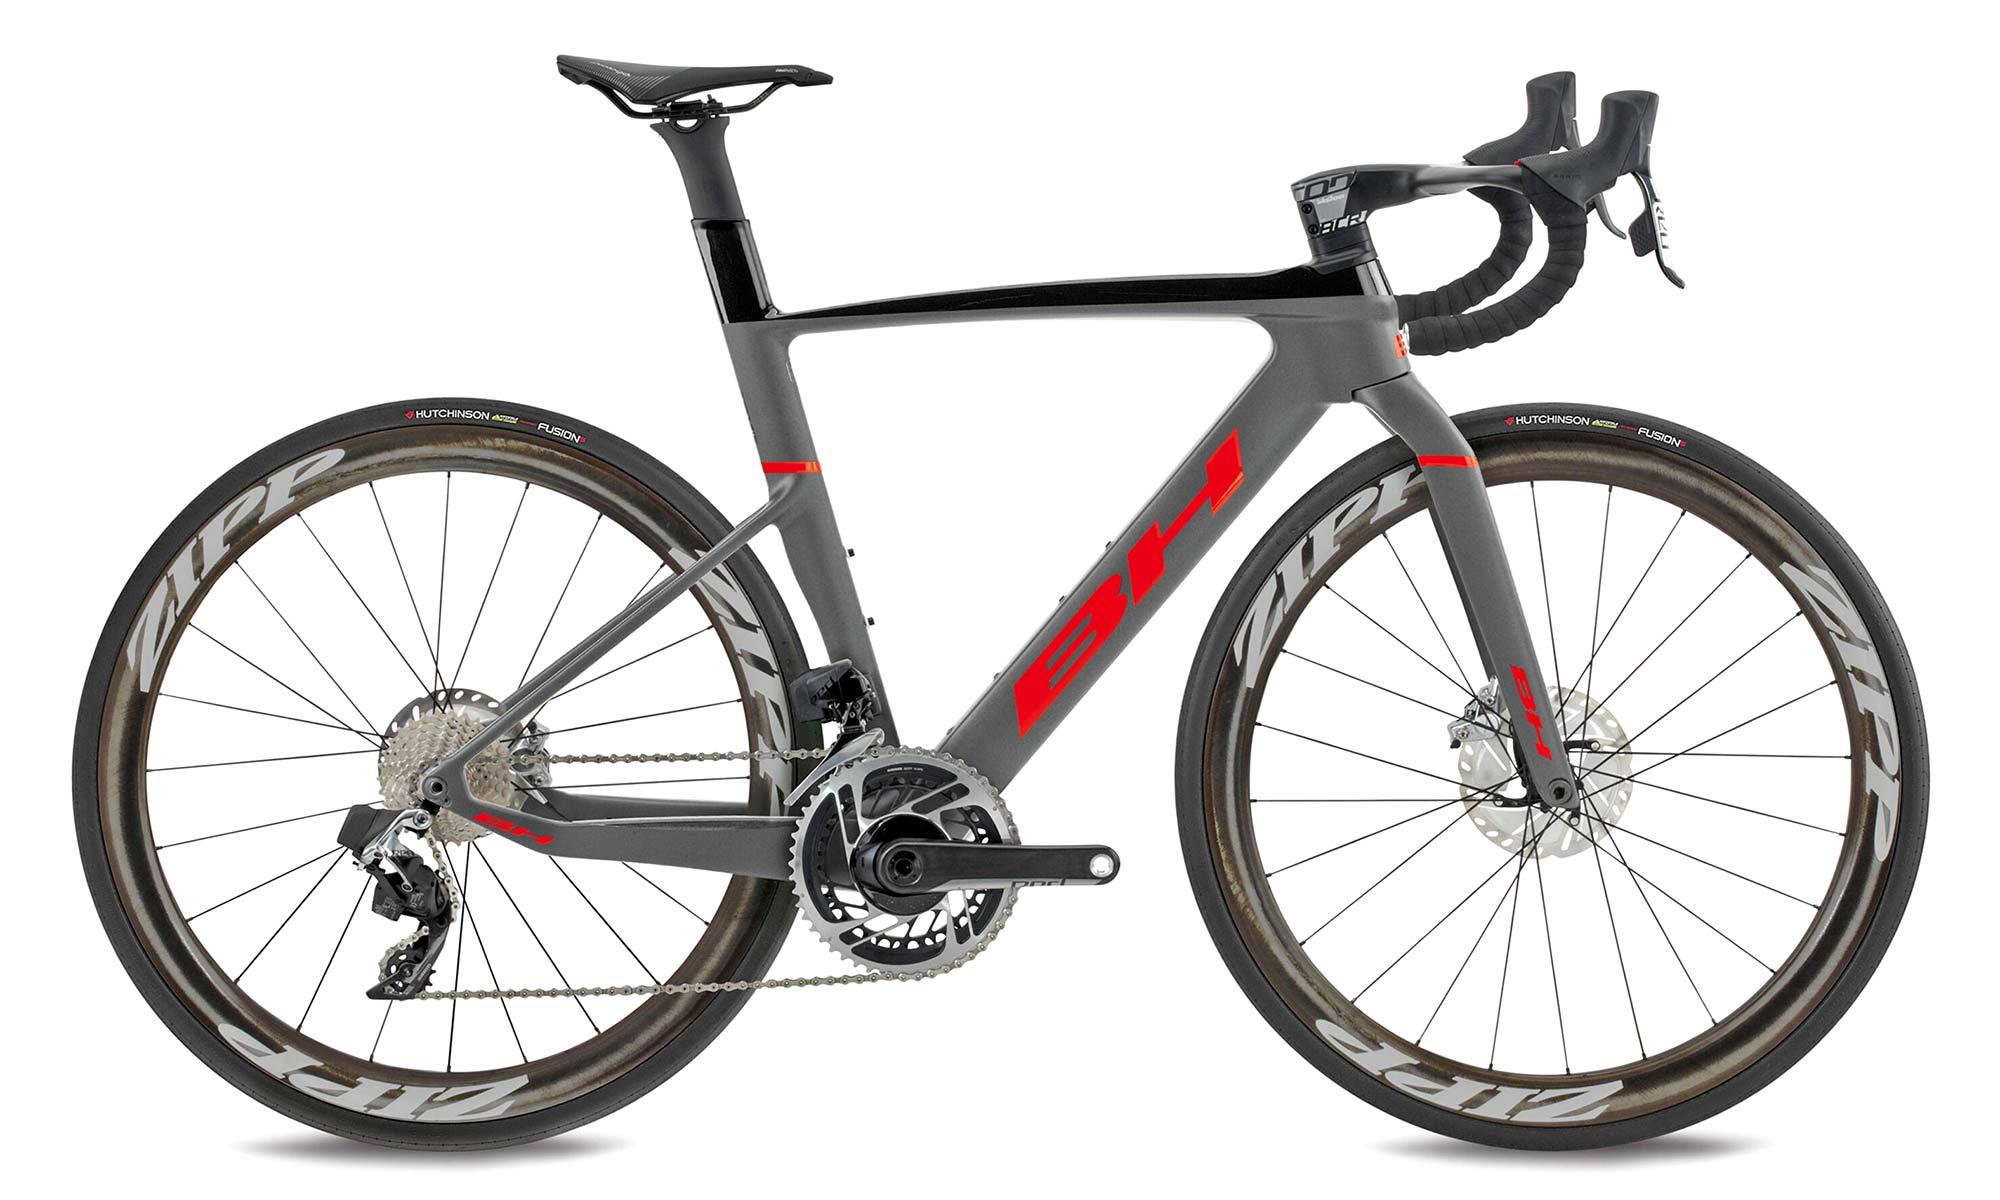 2022 BH Aerolight lightweight aero carbon all-rounder road bike,7.5